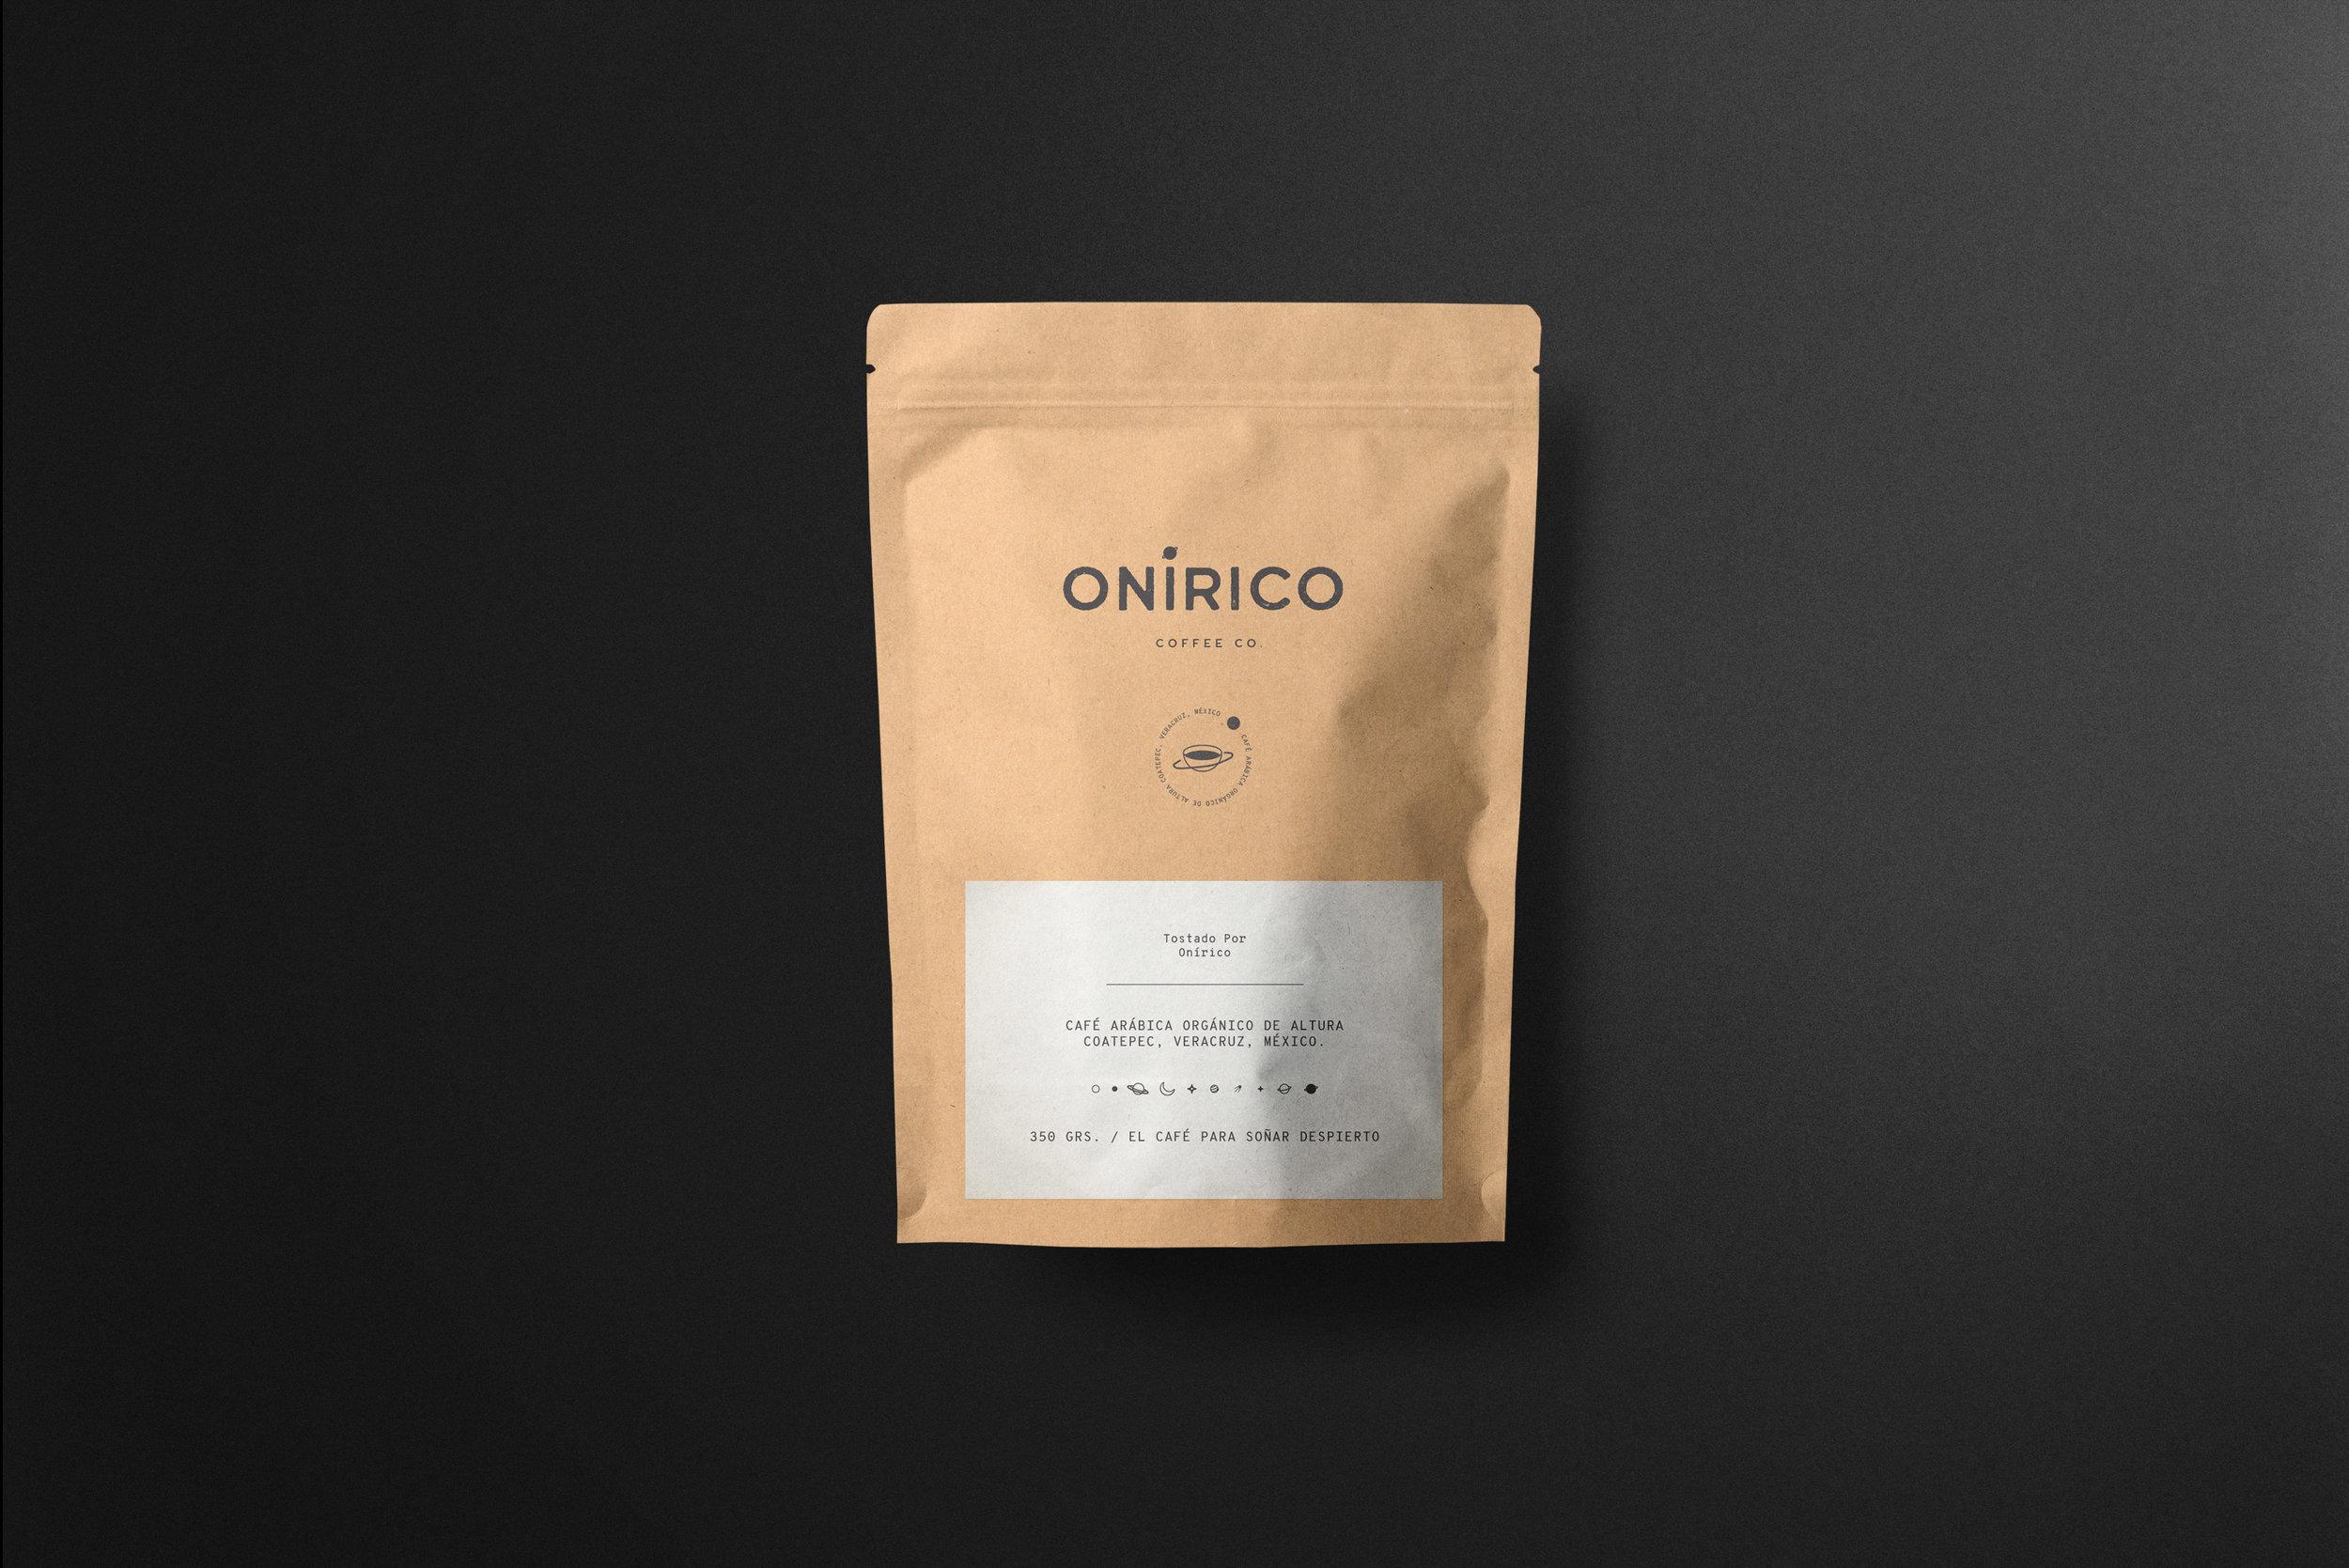 Onirico_Bolsa_Cafe_3.jpg